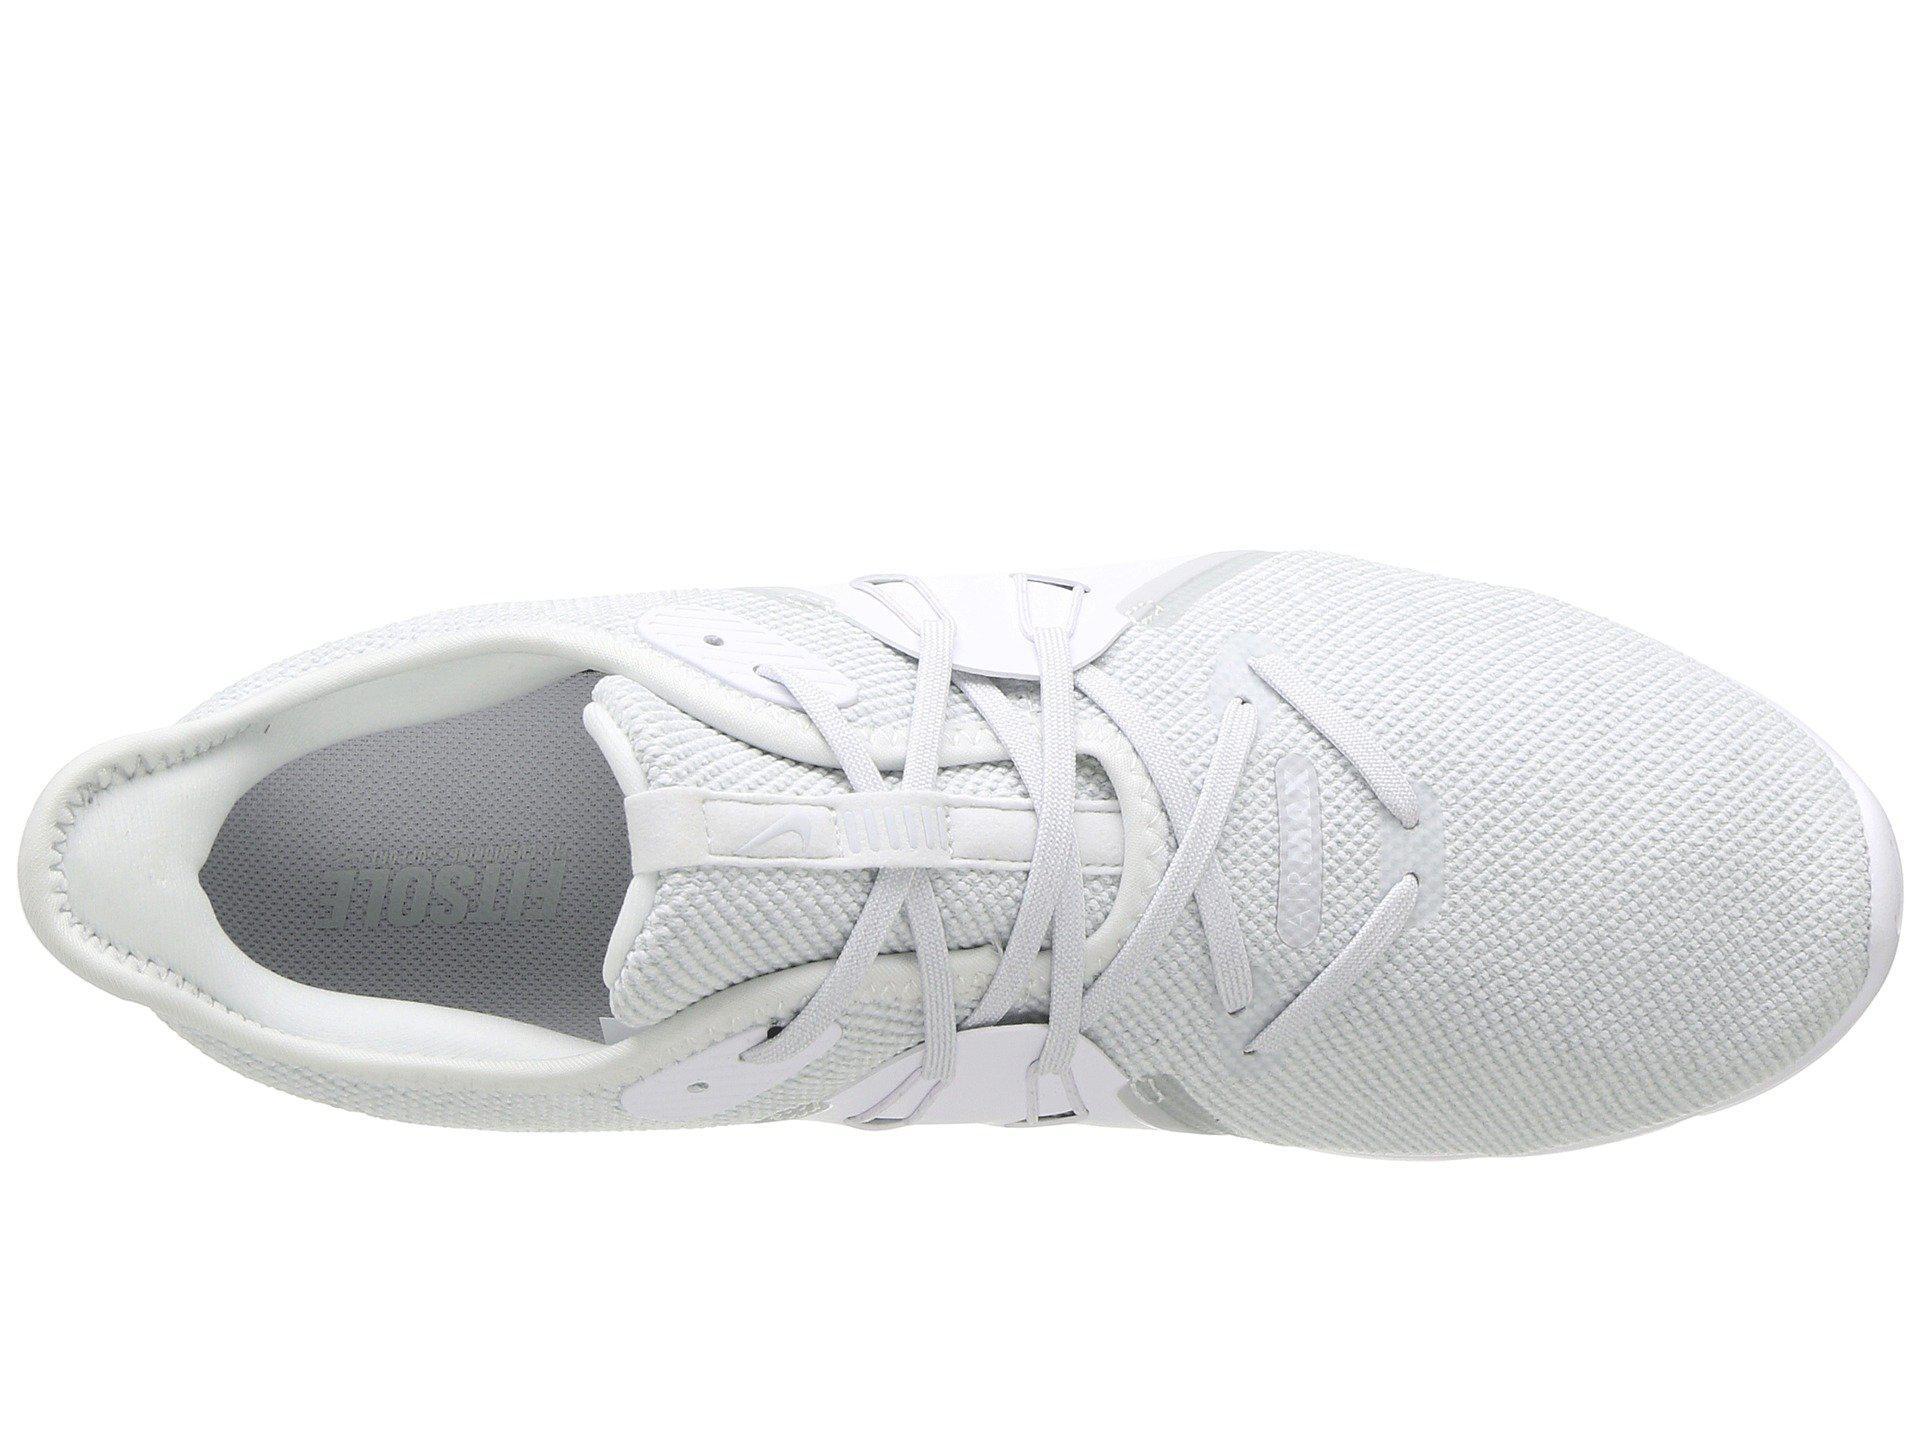 faeffd79cec Nike - White Air Max Sequent 3 for Men - Lyst. View fullscreen